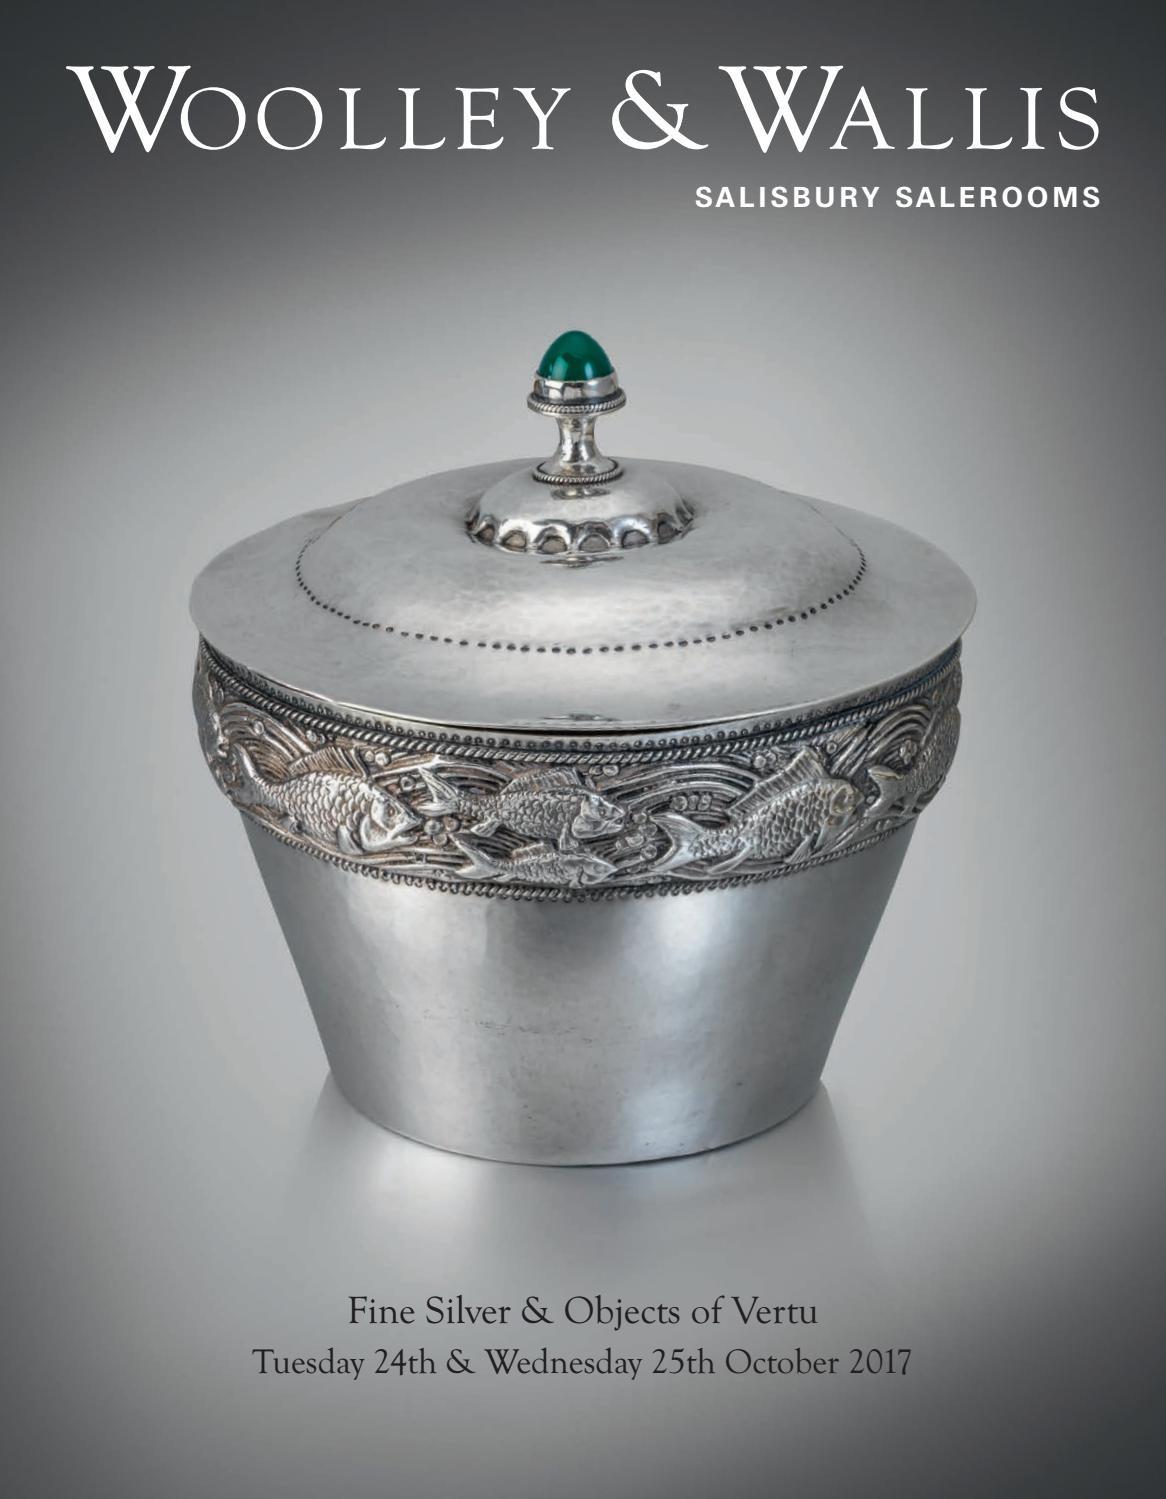 christofle orangerie vase of woolley wallis auctioneers by jamm design ltd issuu regarding page 1